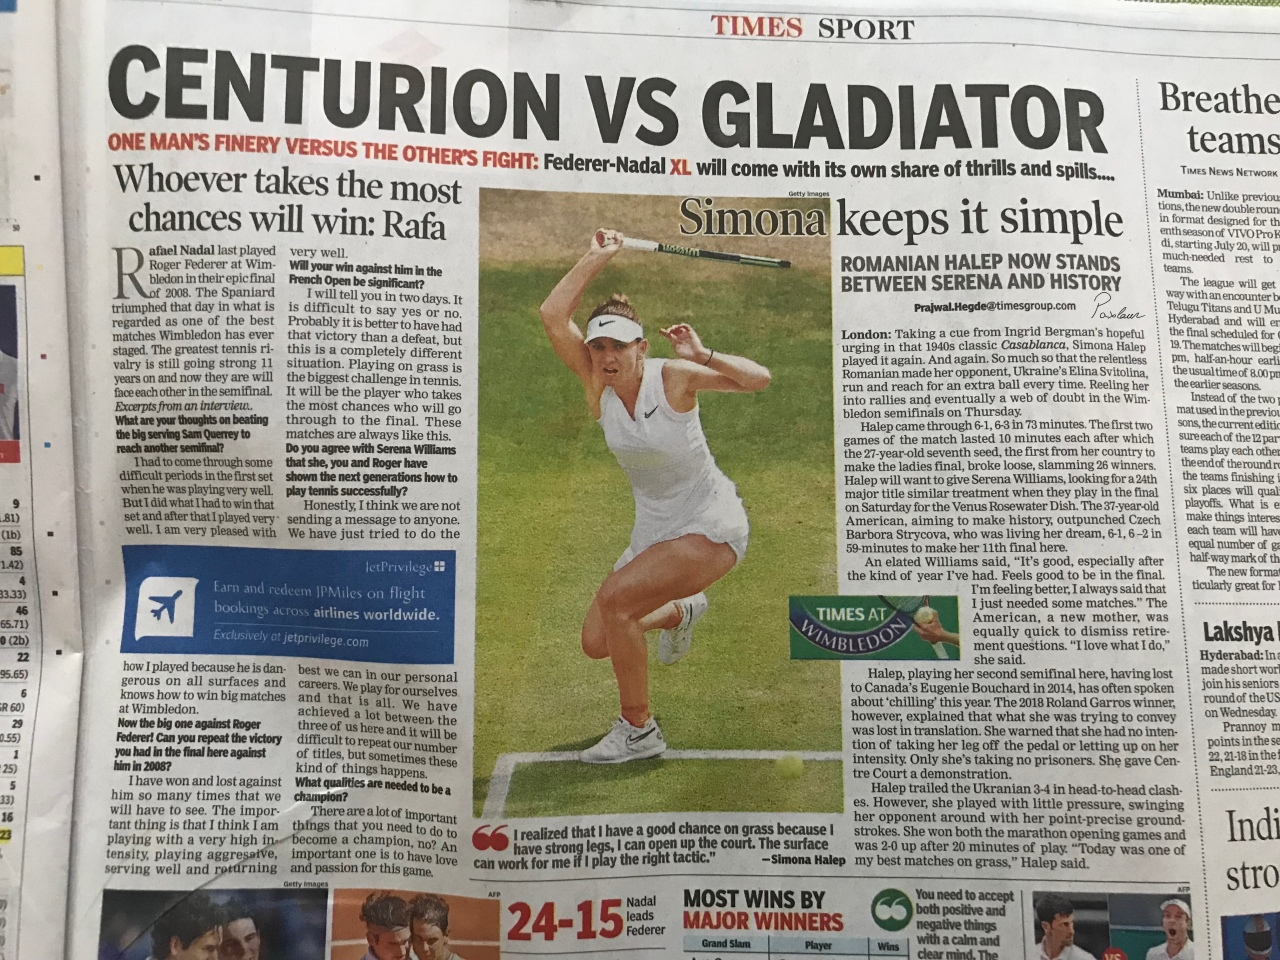 Simona_Halep_Tims of India